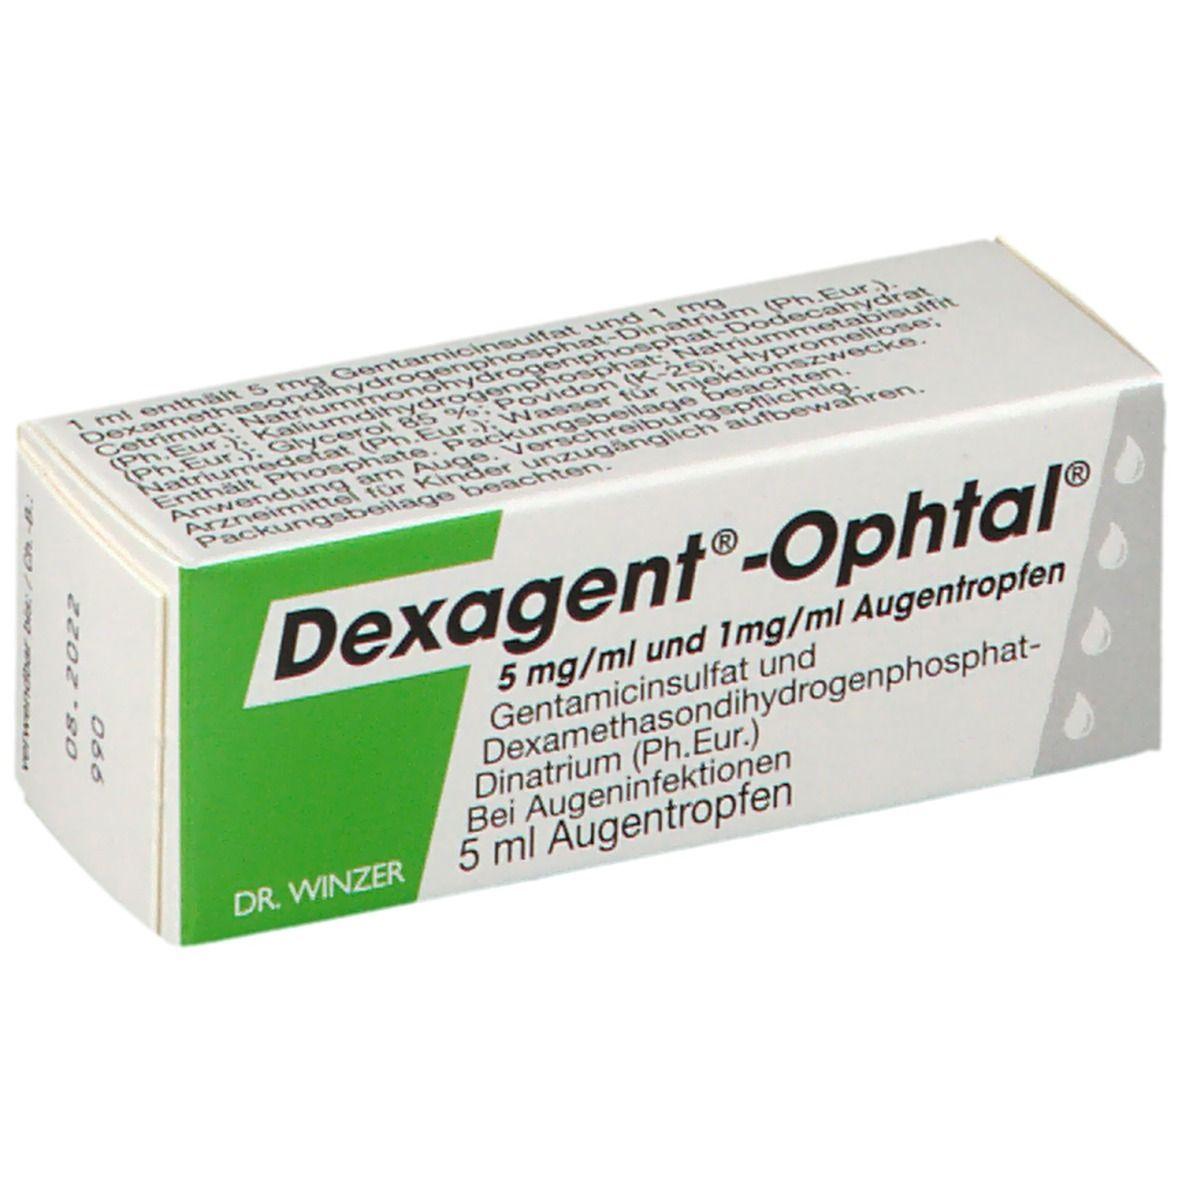 DEXAGENT Ophtal 5 ml - shop-apotheke.com